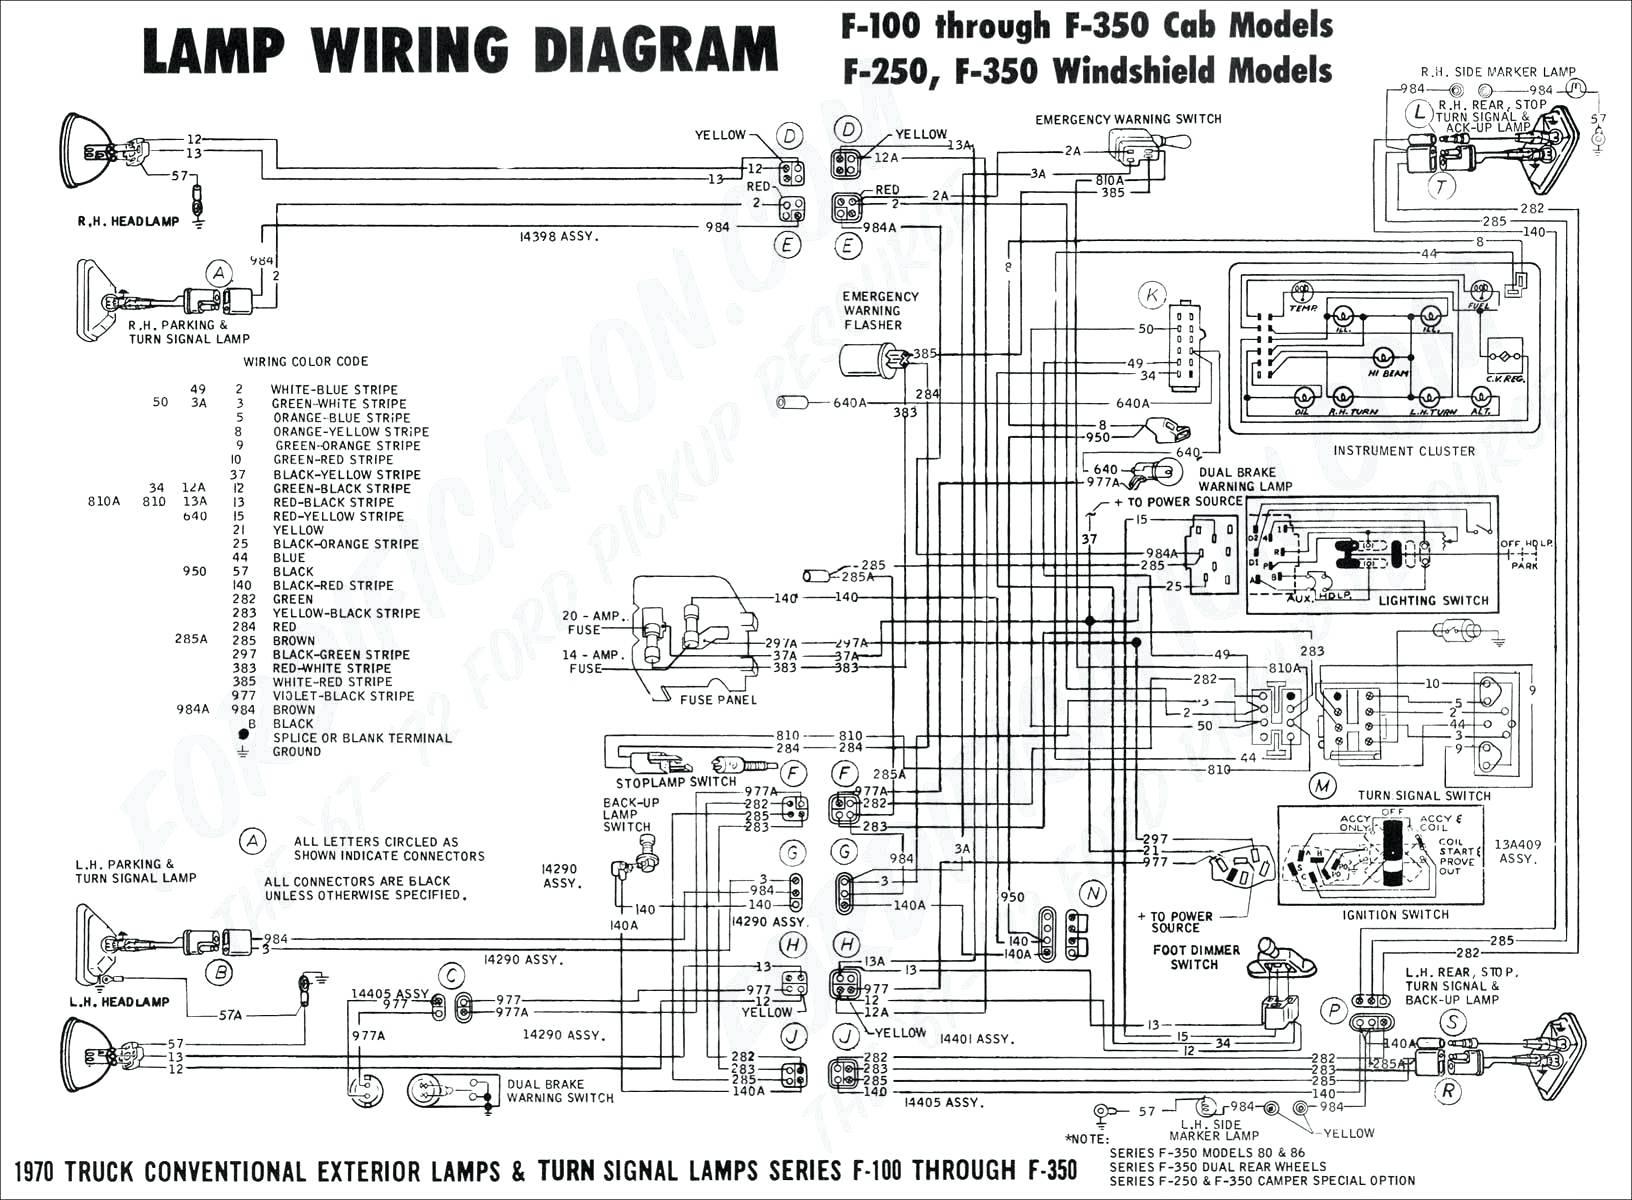 1997 Dodge Ram 2500 Trailer Wiring Diagram